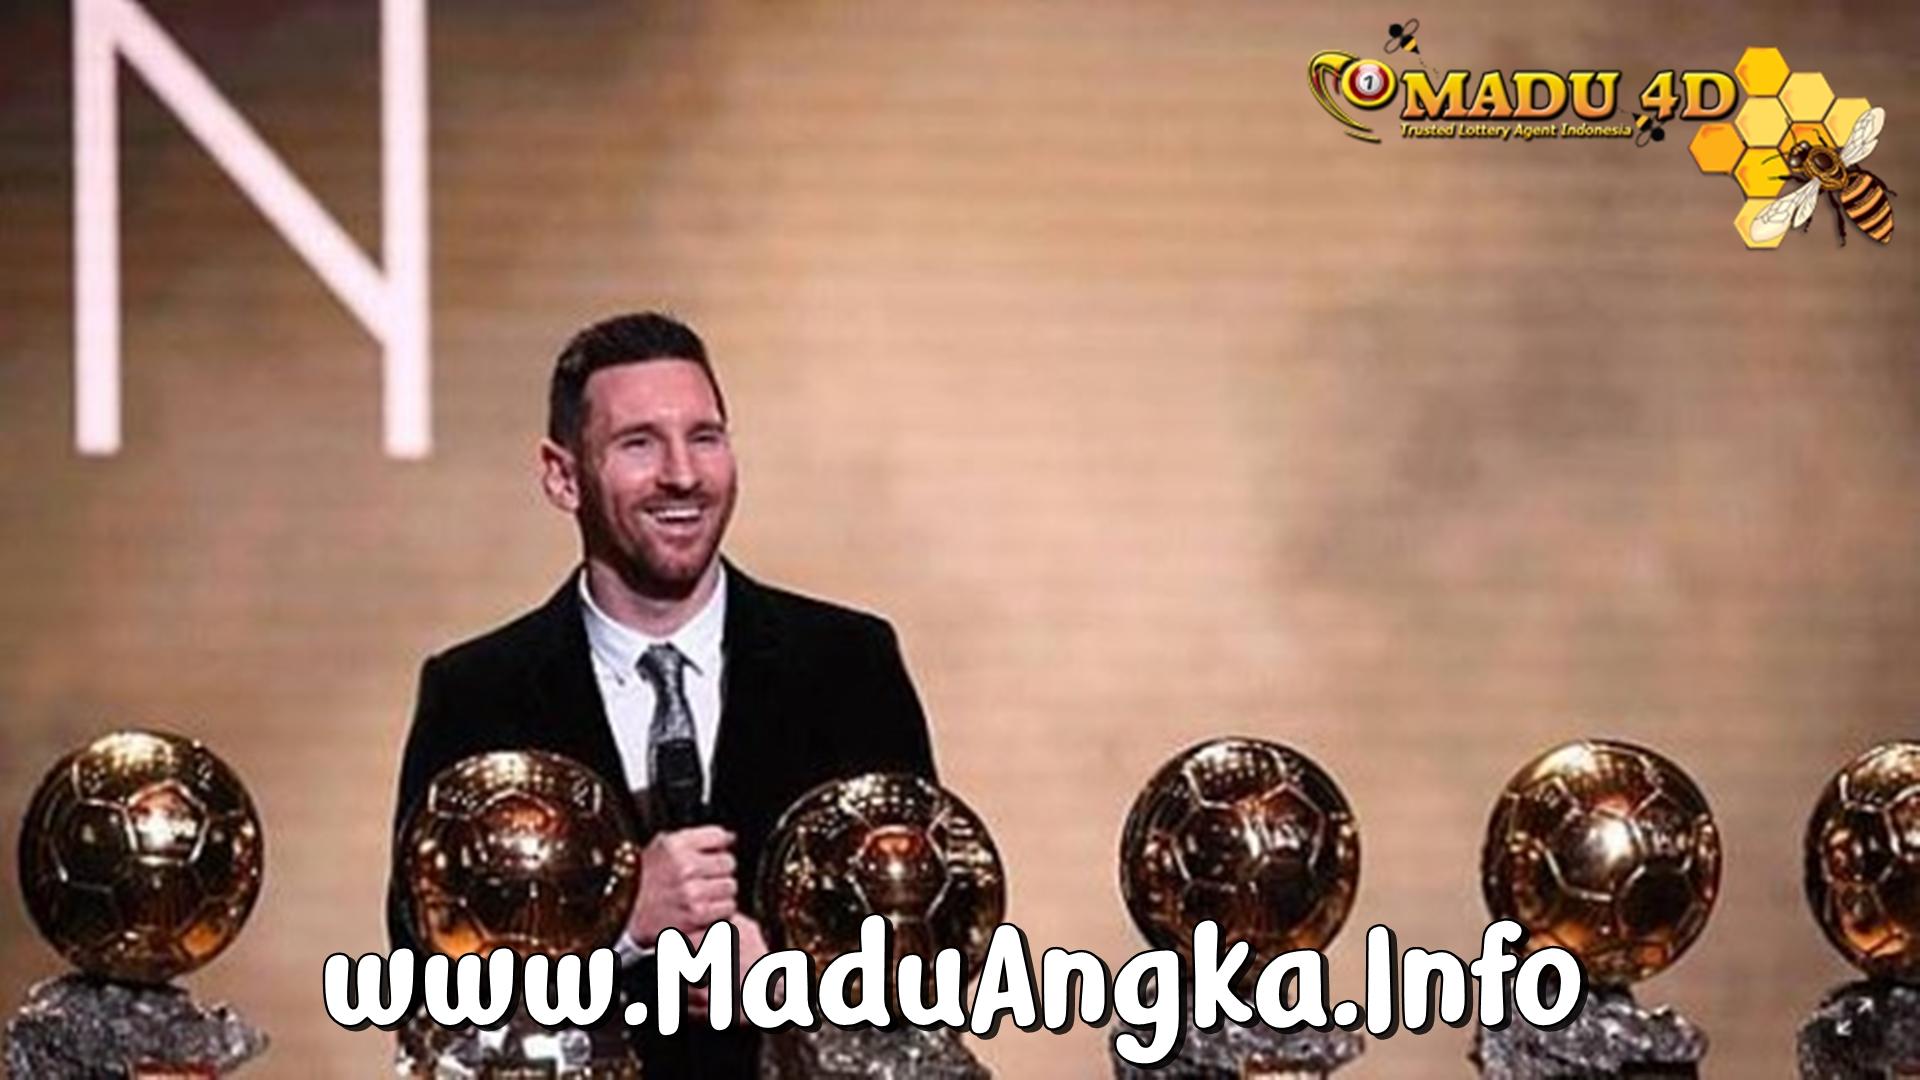 Lionel Messi dan Carli Lloyd Jadi Ikon Kampanye FIFA-WHO